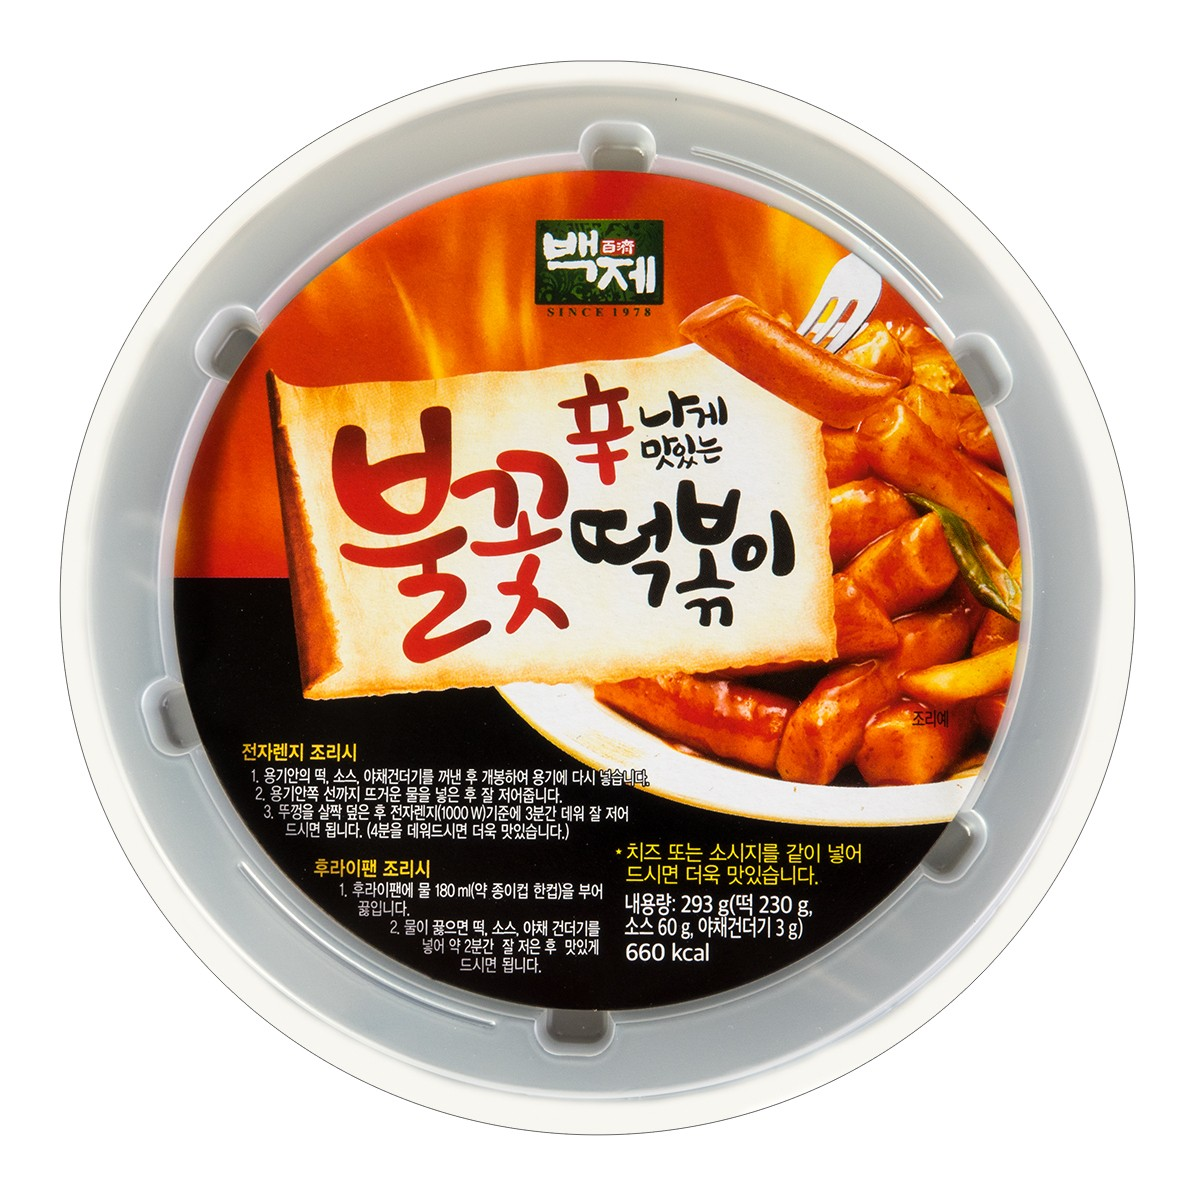 Baekje Rice Cake Bowl w/Spicy Sauce 293g